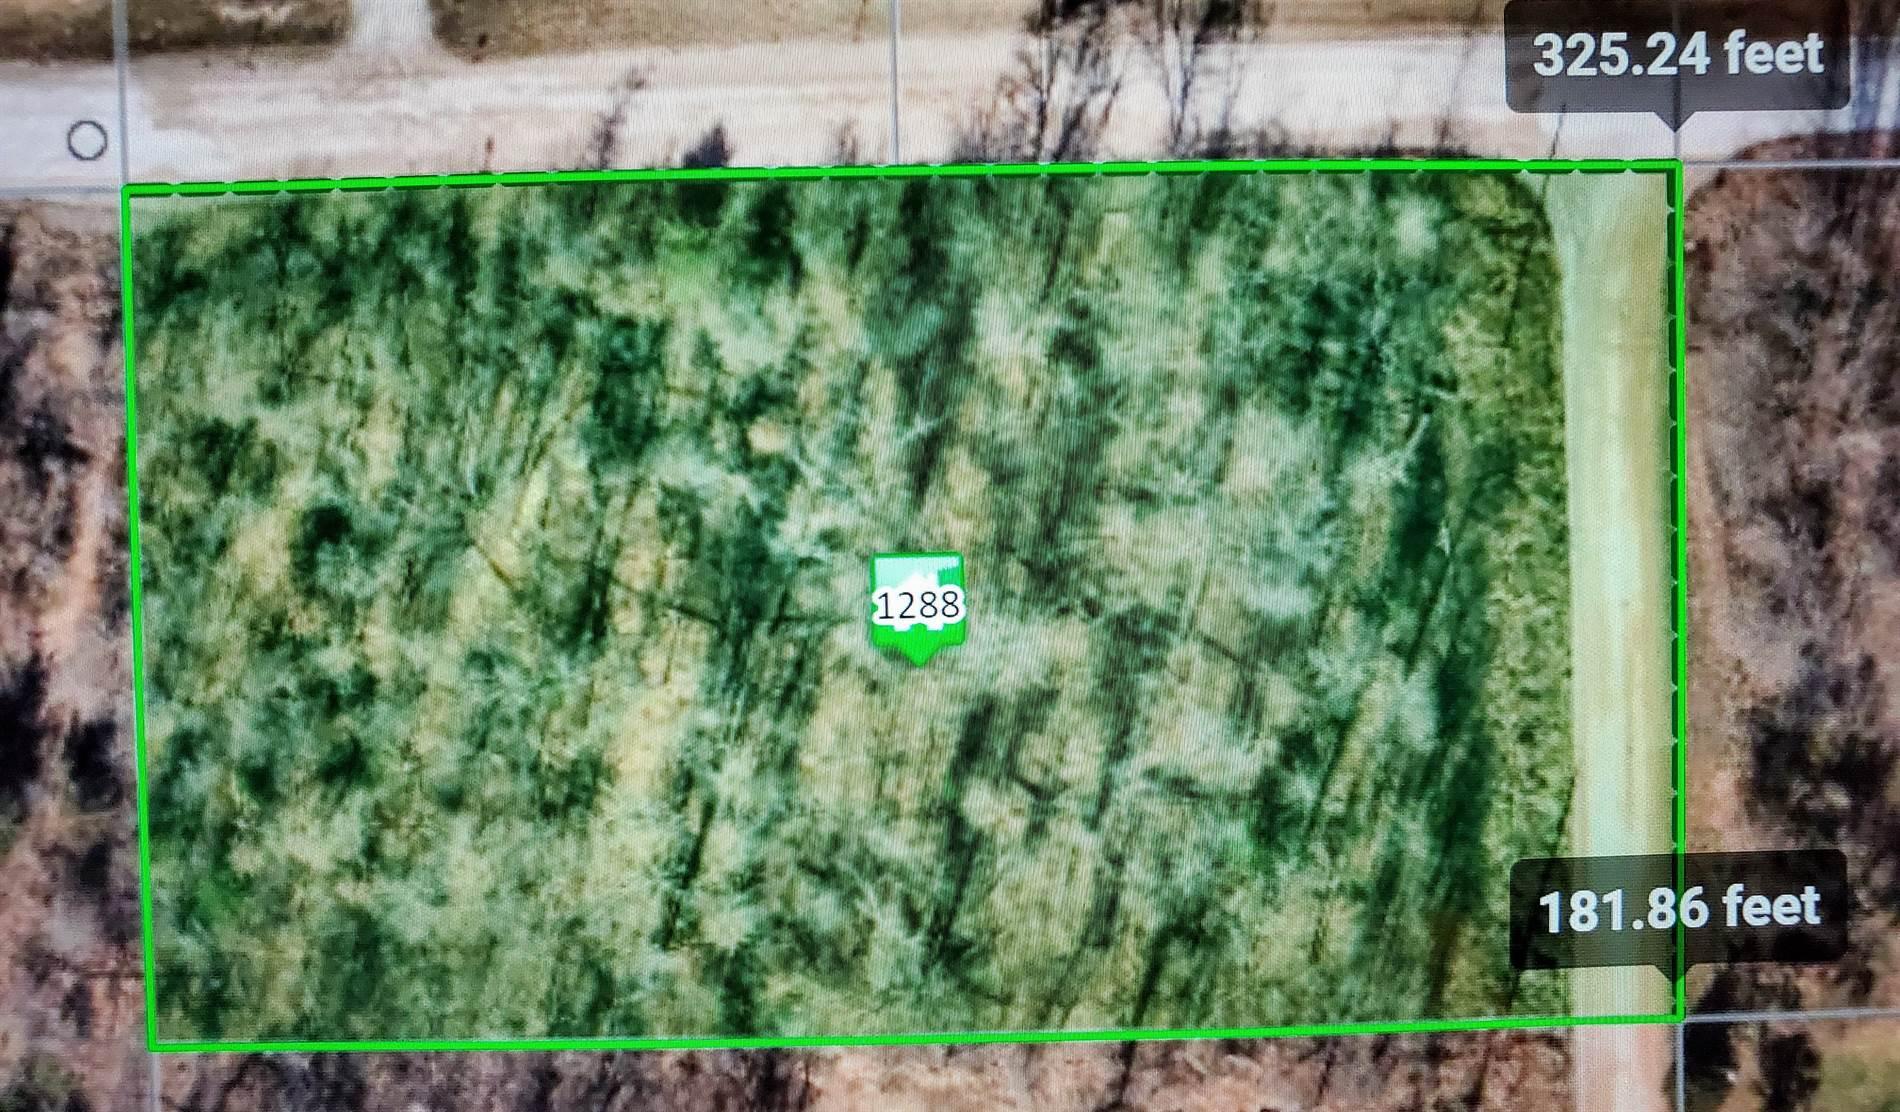 16603 Acorn, Newalla, OK 74857